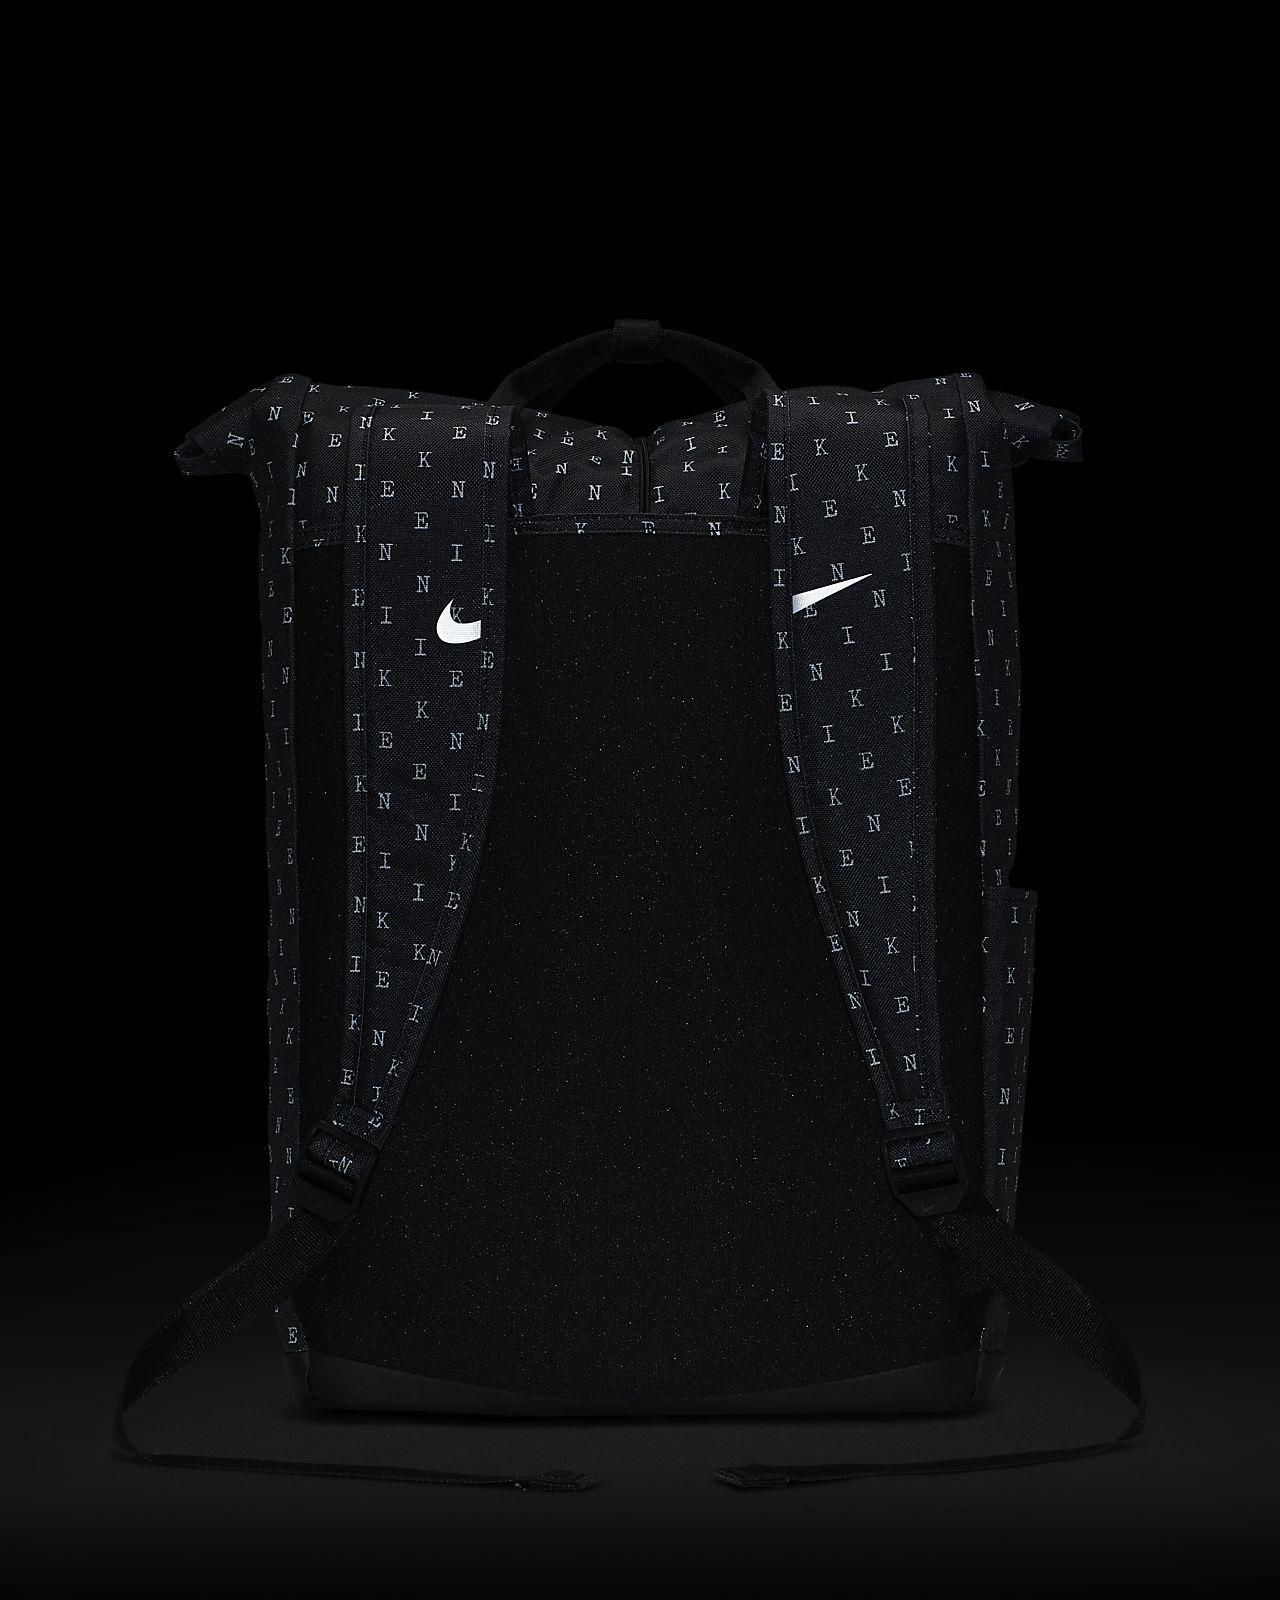 Mochila de treino Nike Radiate para mulher